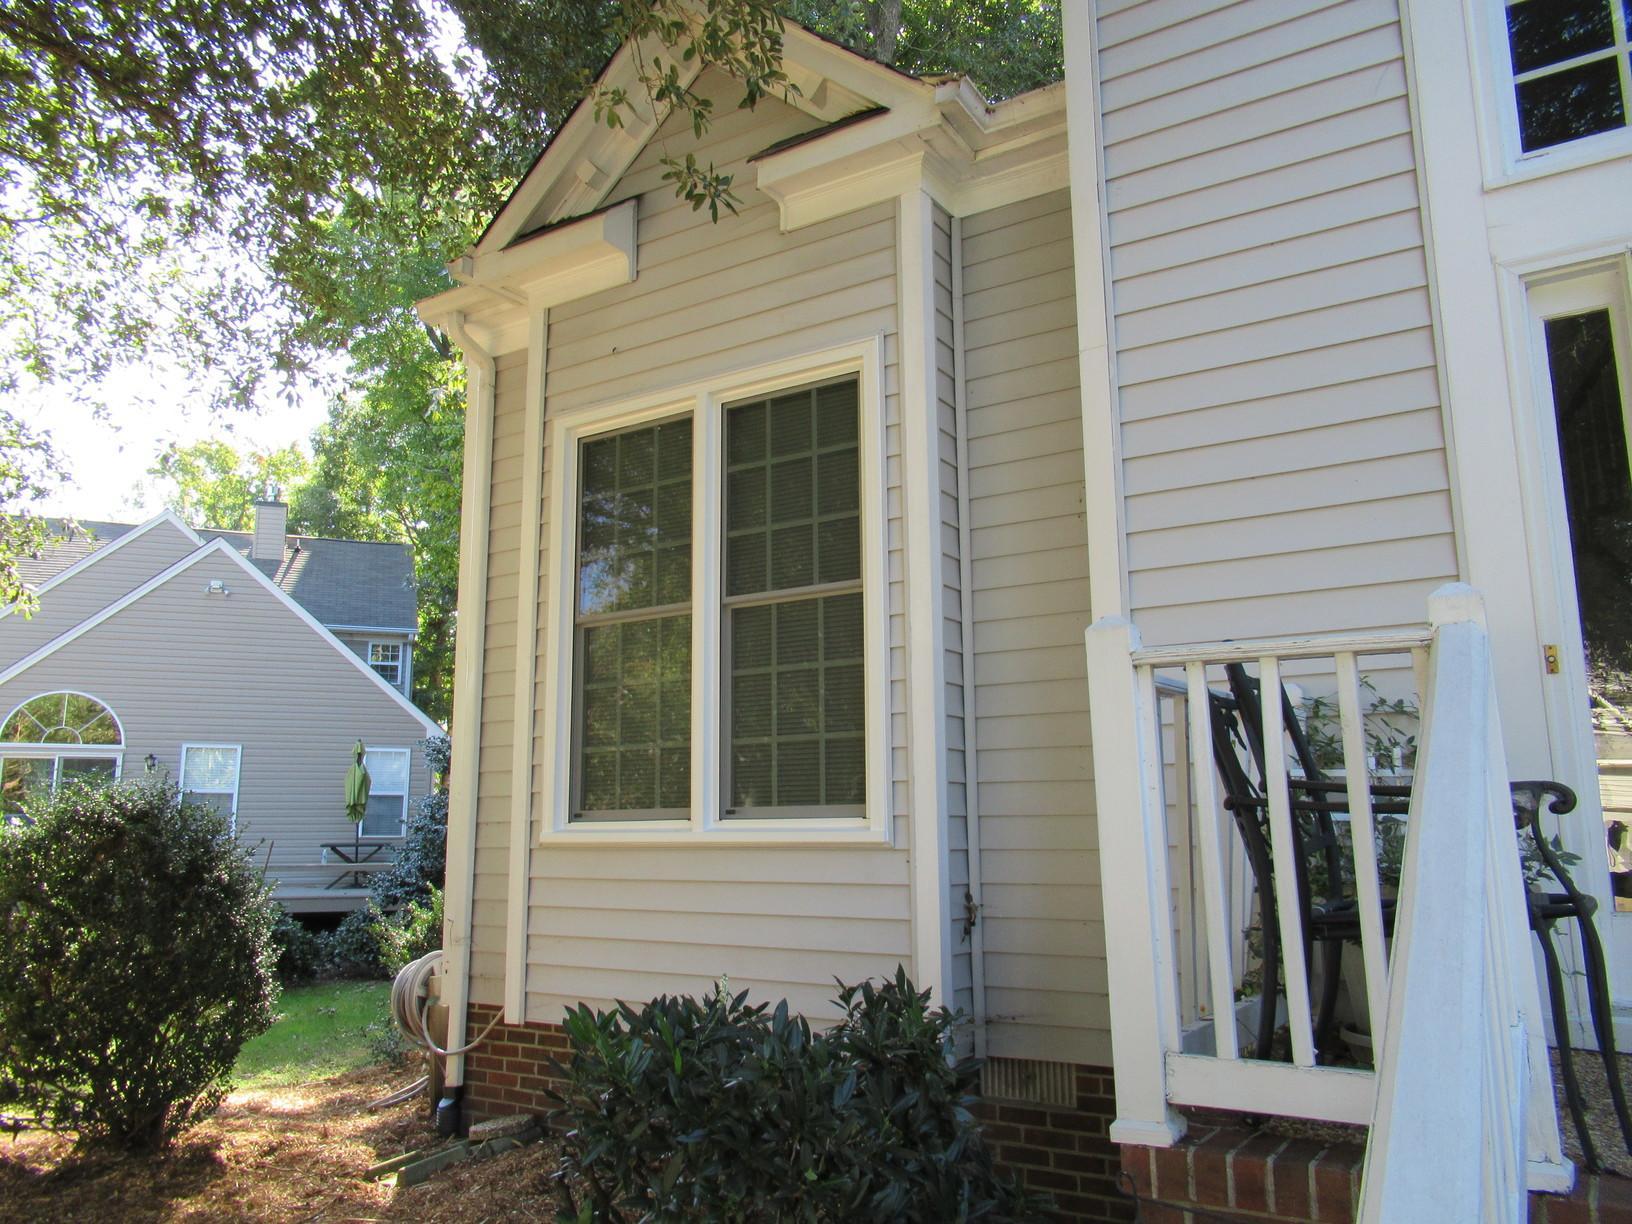 Wood Window Replacement in Newport News, VA - After Photo